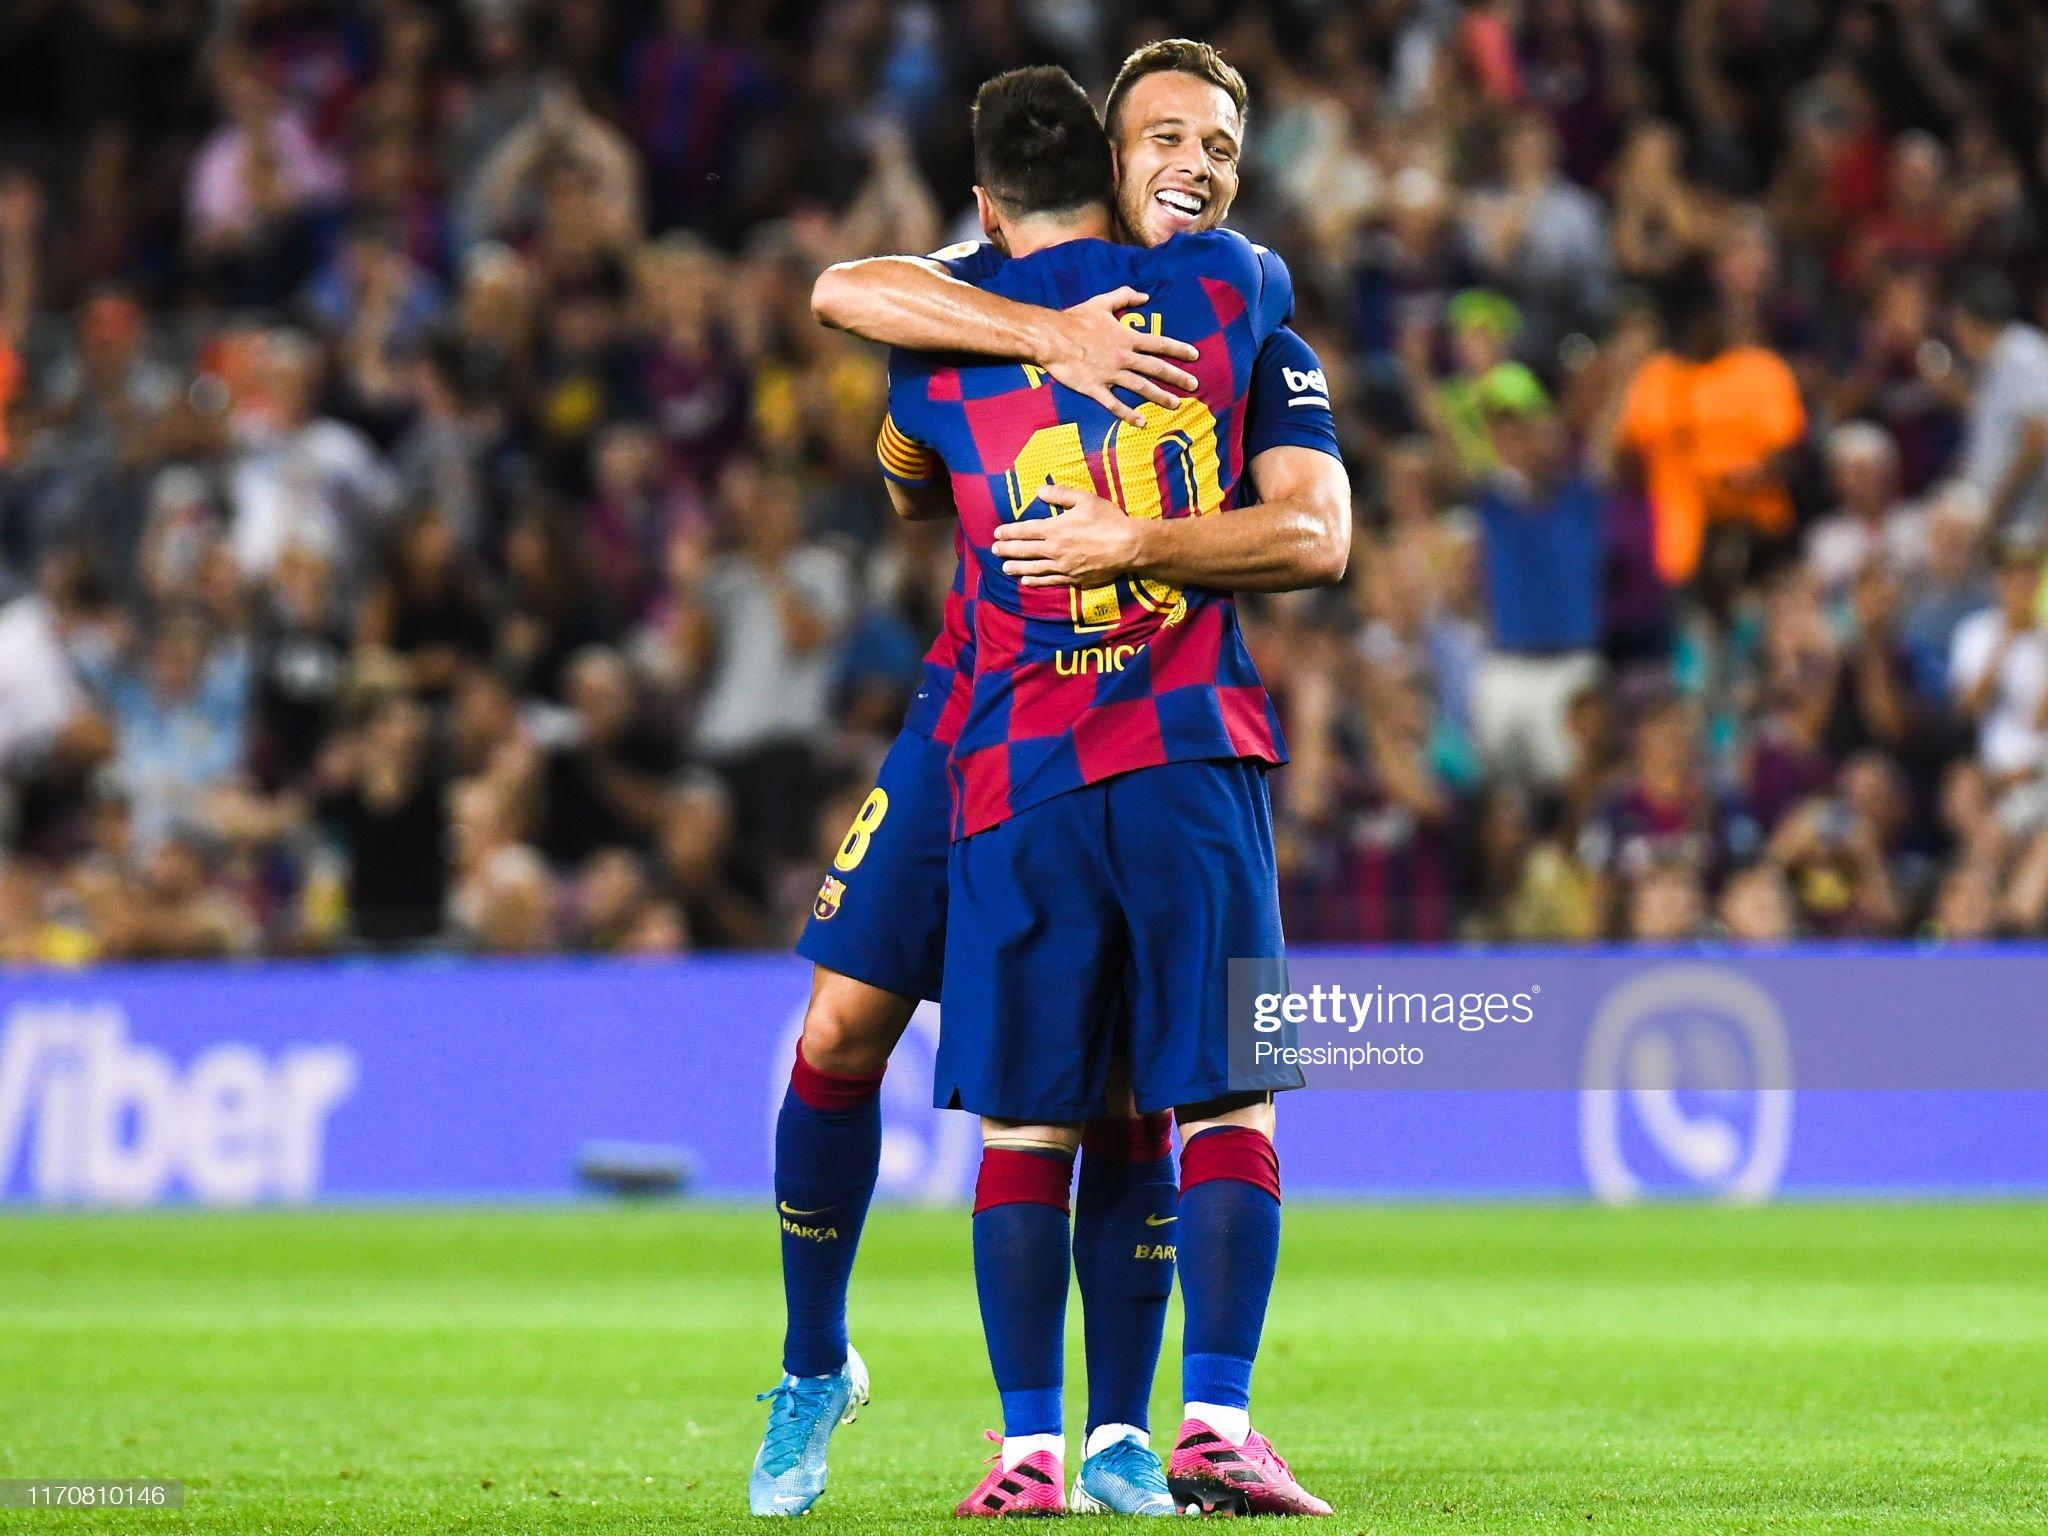 صور مباراة : برشلونة - فياريال 2-1 ( 24-09-2019 )  Arthur-melo-of-fc-barcelona-celebrates-his-goal-with-his-teammates-picture-id1170810146?s=2048x2048